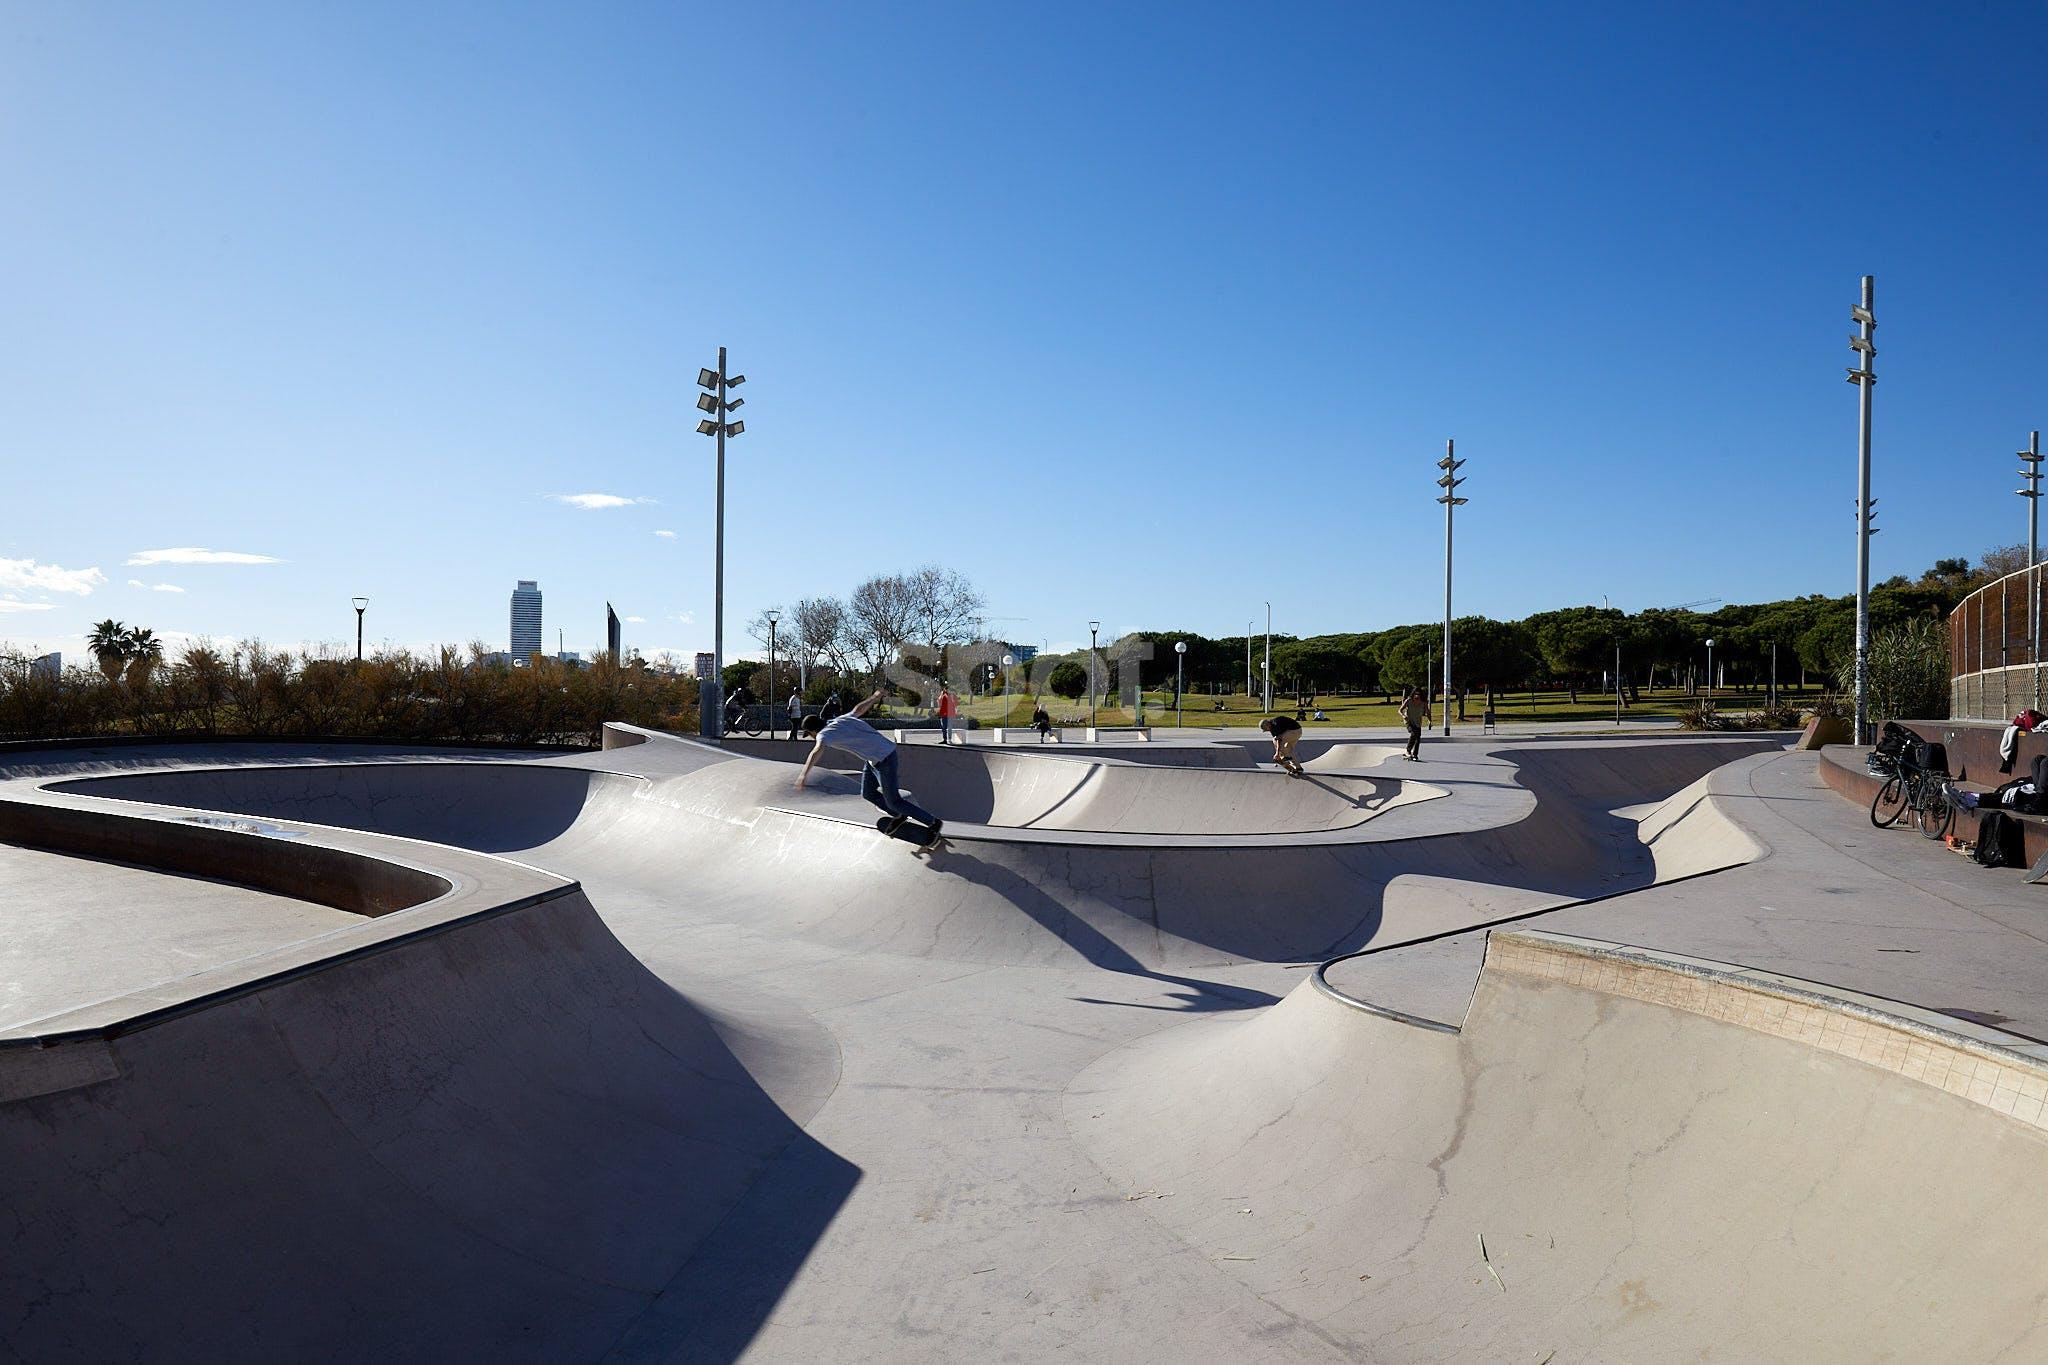 Skatepark Barcelona, Spain